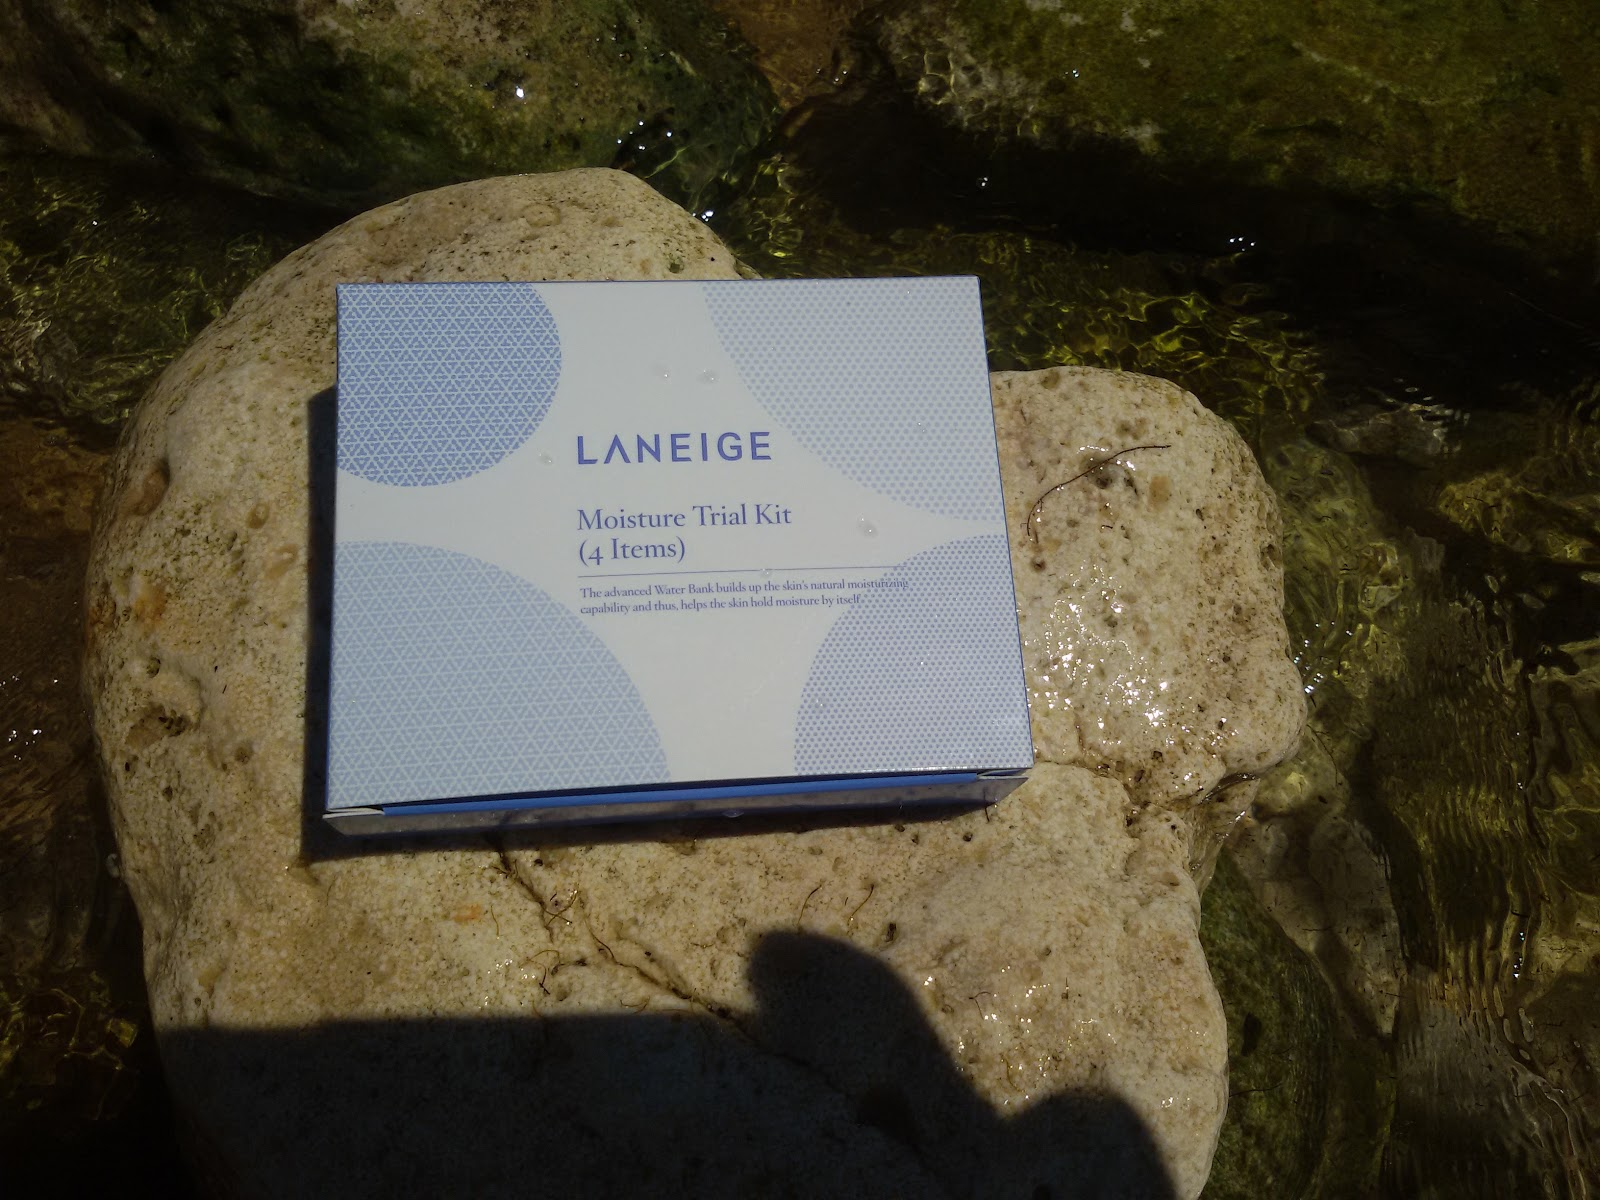 Увлажняющий дорожный наборчик Laneige Moisture Trial Kit (4 items): было сухо - стало мокро